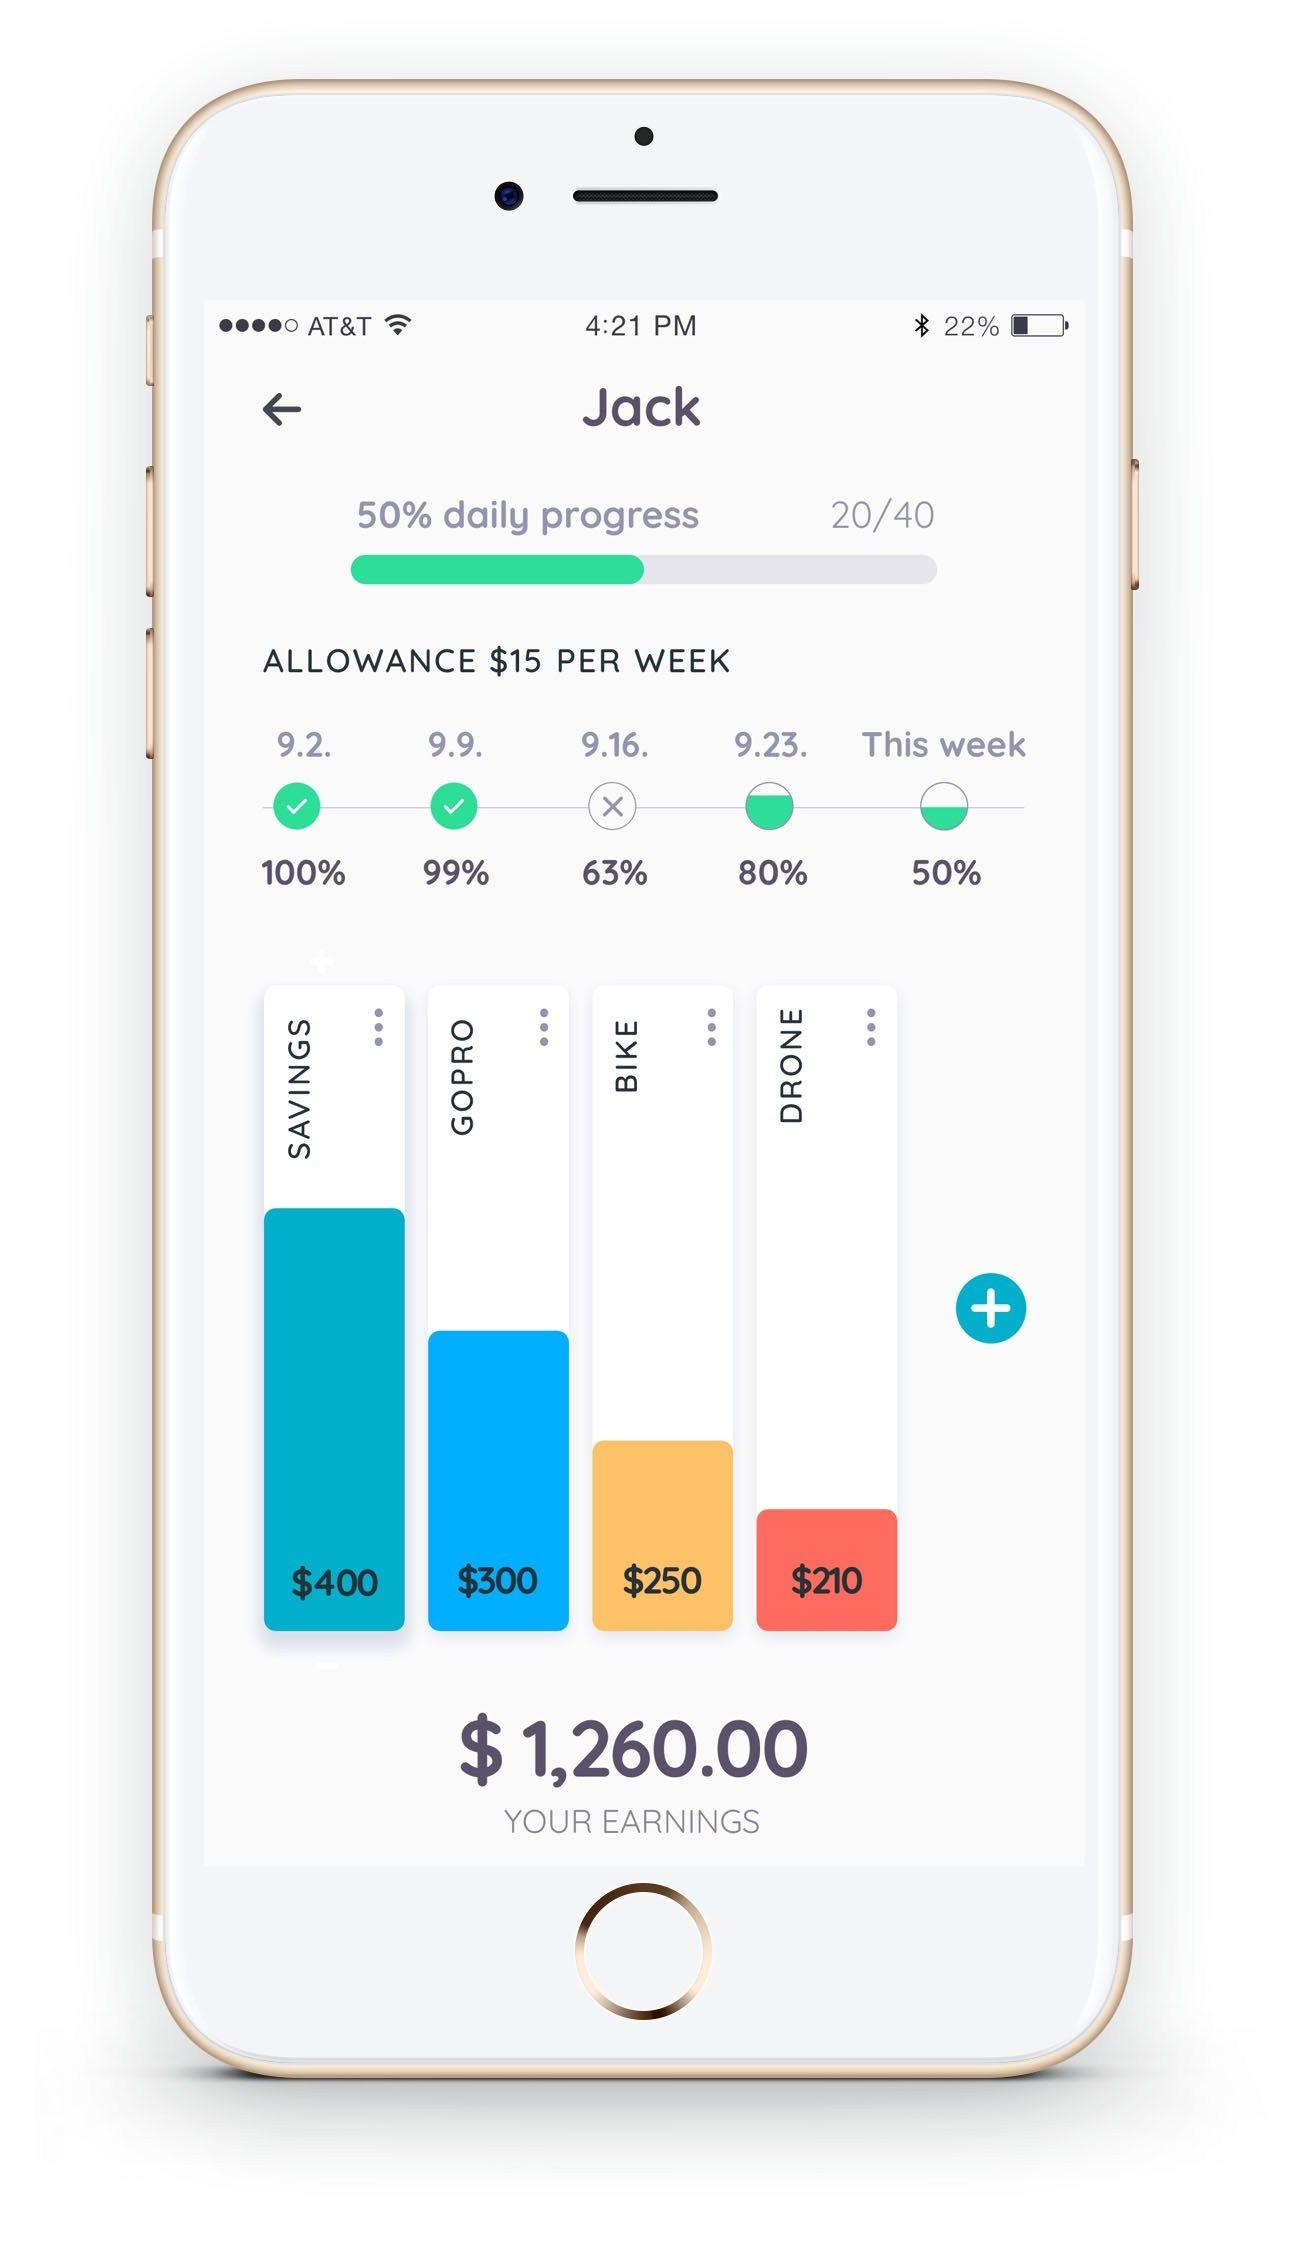 Homey app for Chores, Rewards and Allowance Chores for